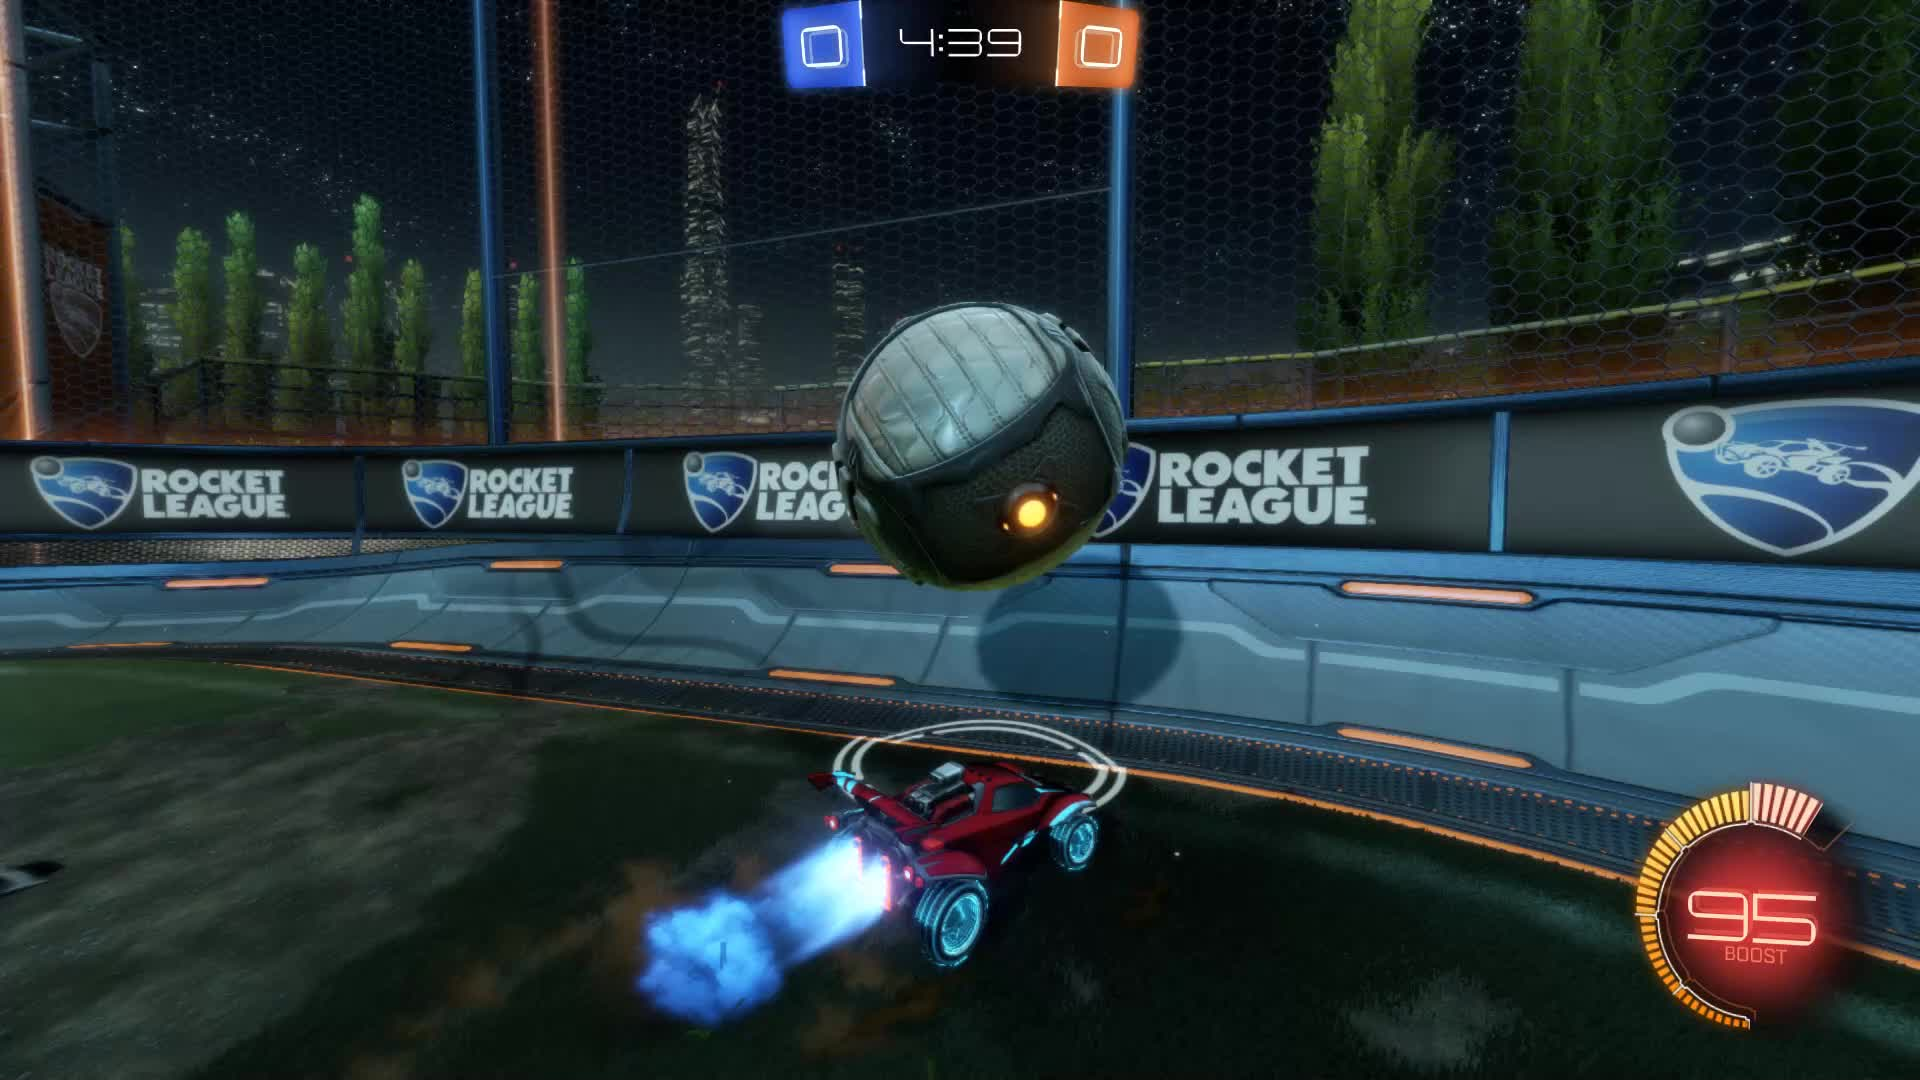 Gif Your Game, GifYourGame, Goal, JAG, Rocket League, RocketLeague, Goal 1: JAG GIFs